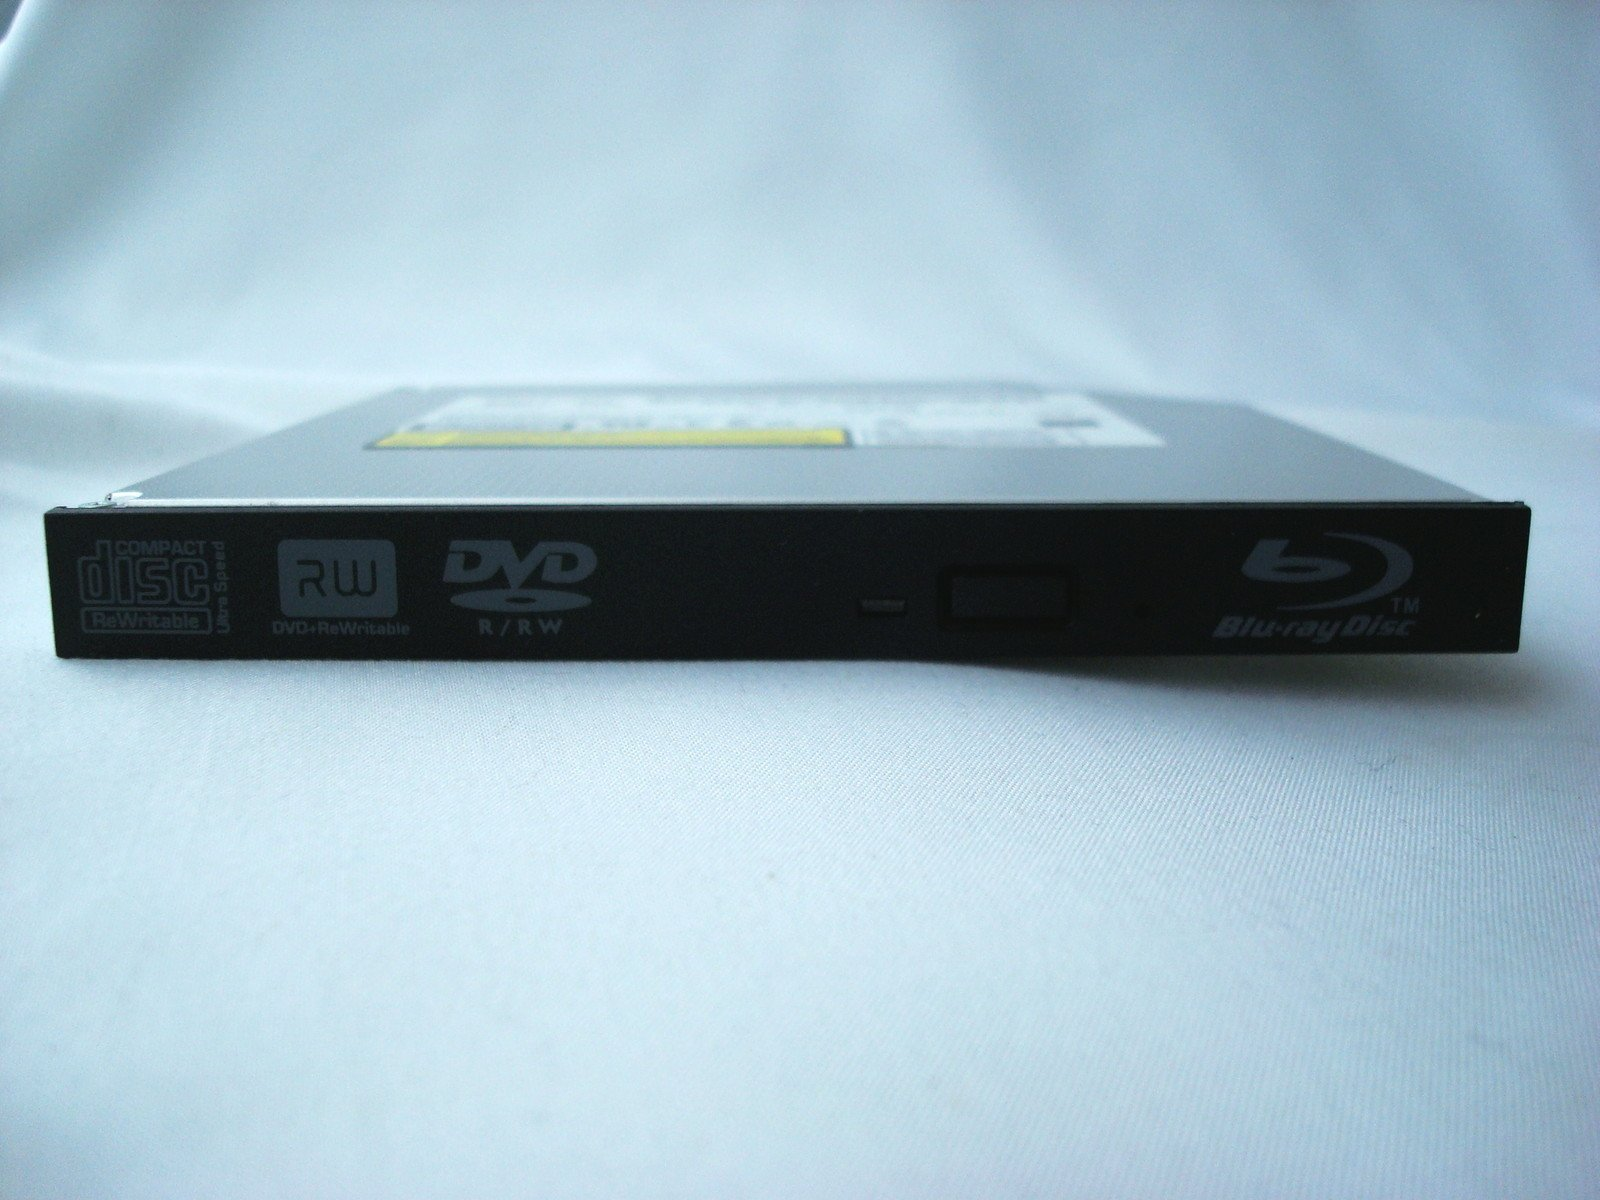 PC-Mart 12.7mm UJ-240, UJ240 6X Blu-Ray Burner Player BD-RE/8x DVD±RW DL SATA Laptop CD Drive by PC-Mart